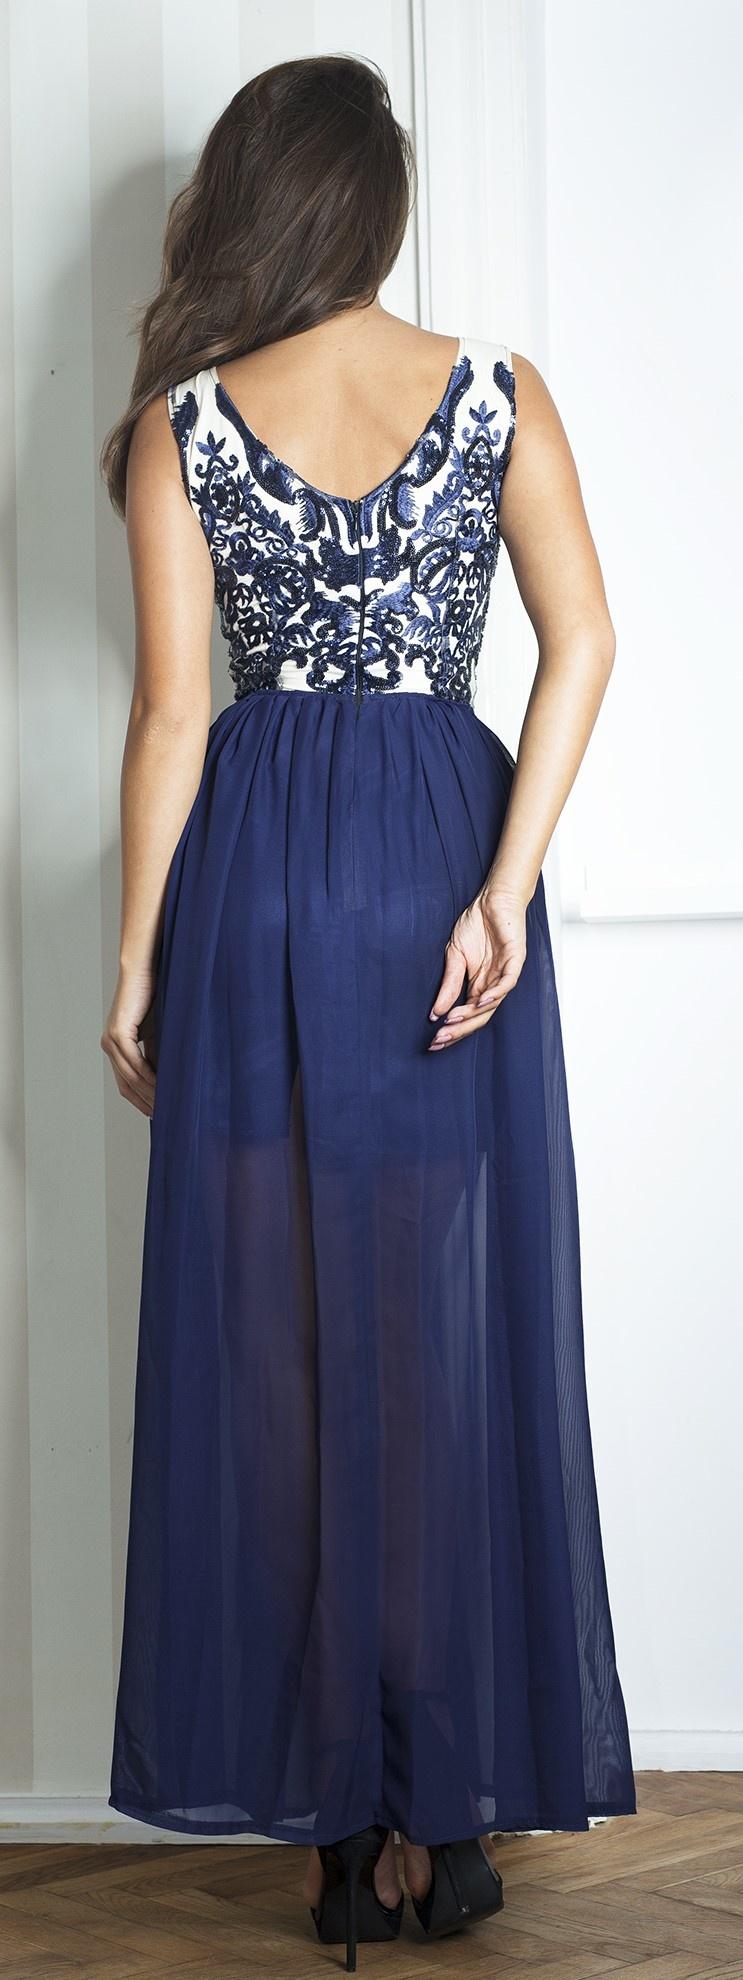 ... modré Plesové šaty Lexa e17e680af3c